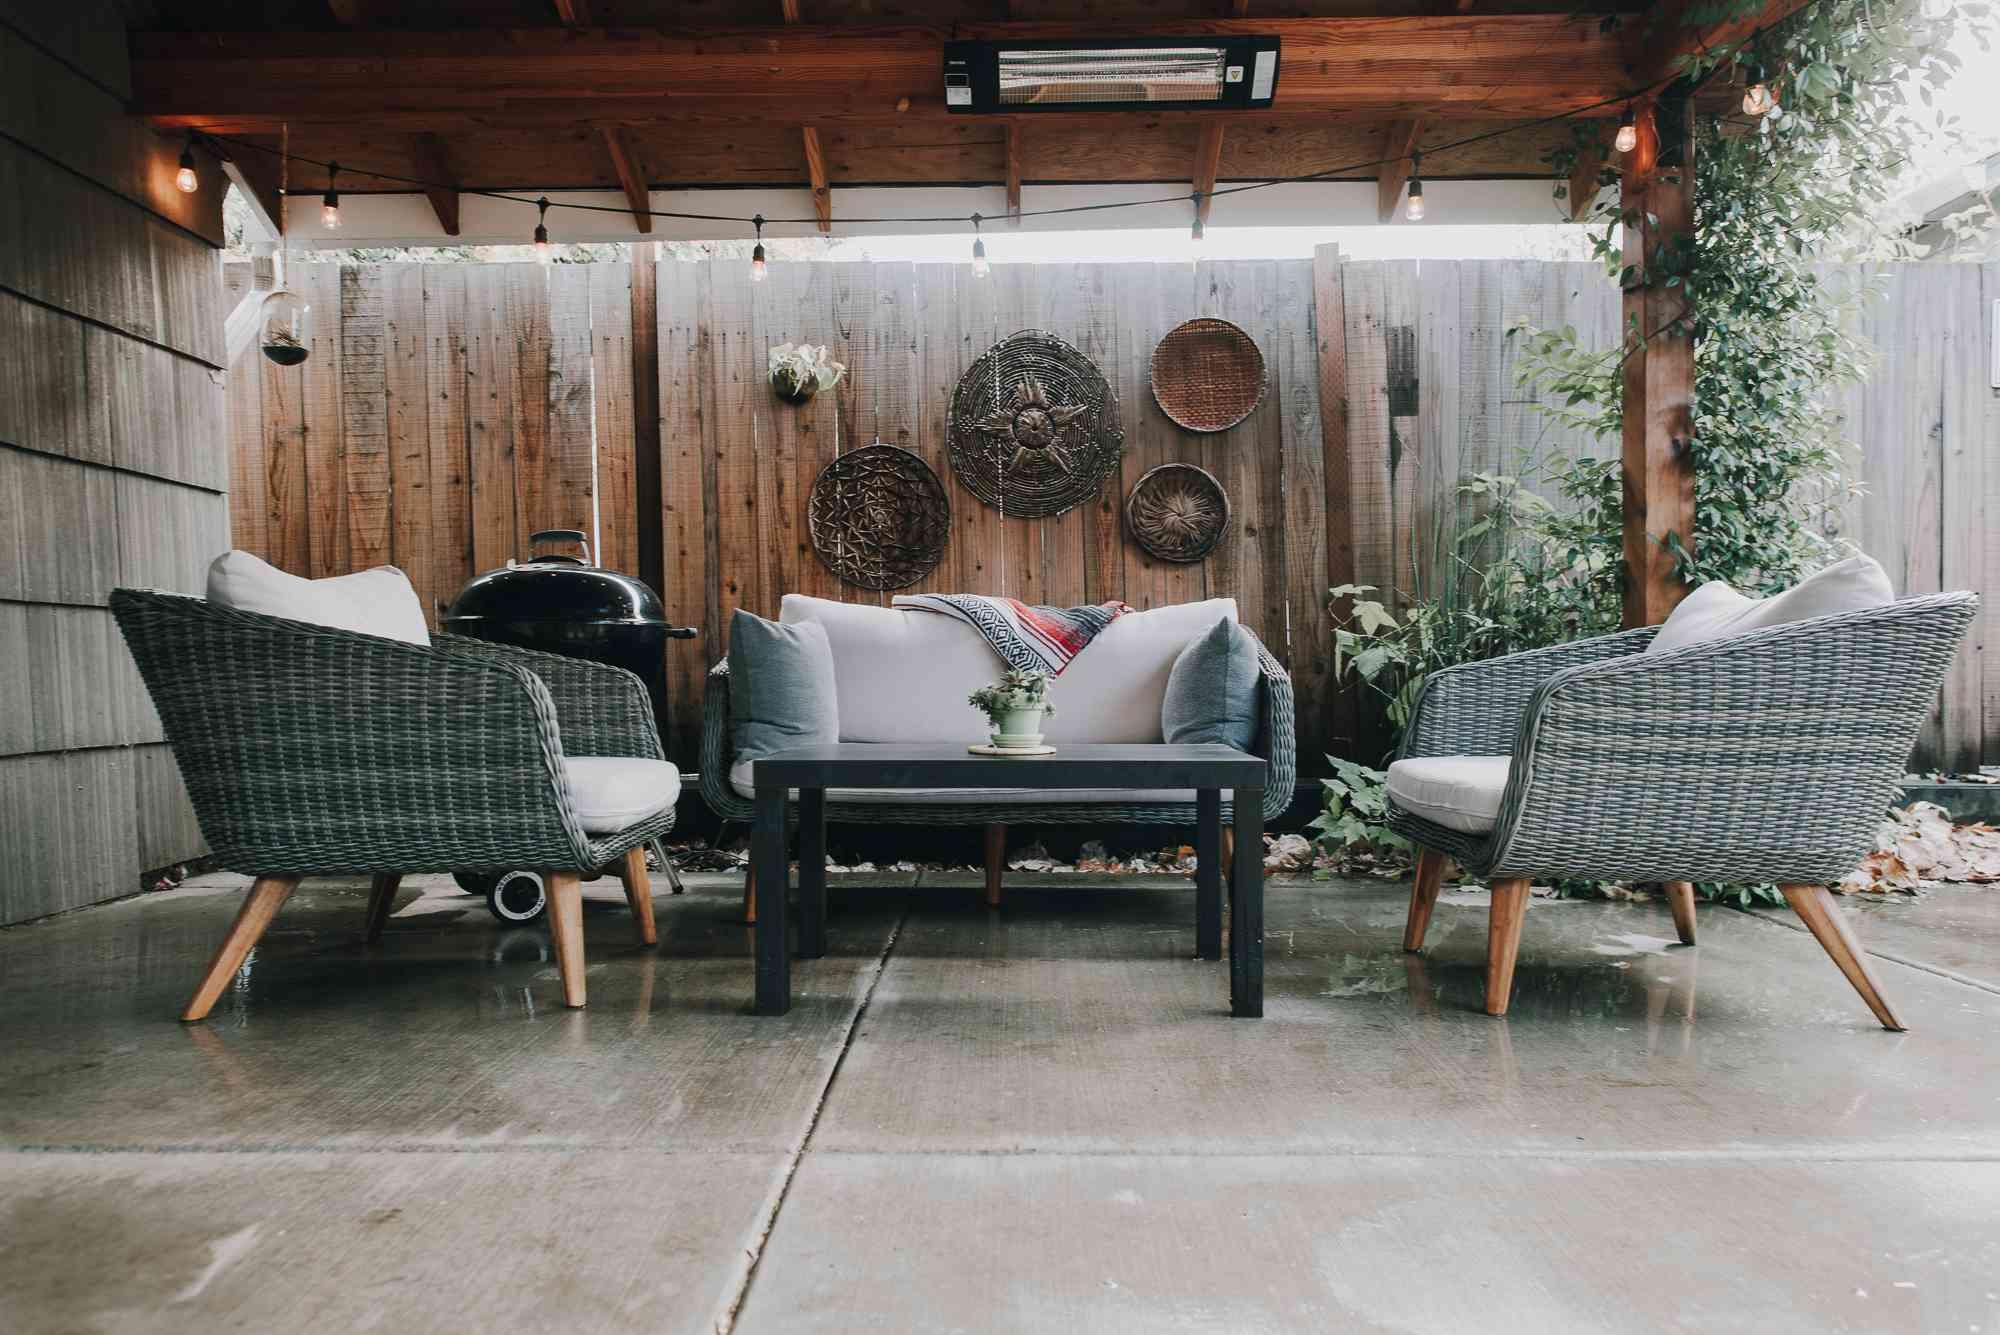 arbor and co apartment patio